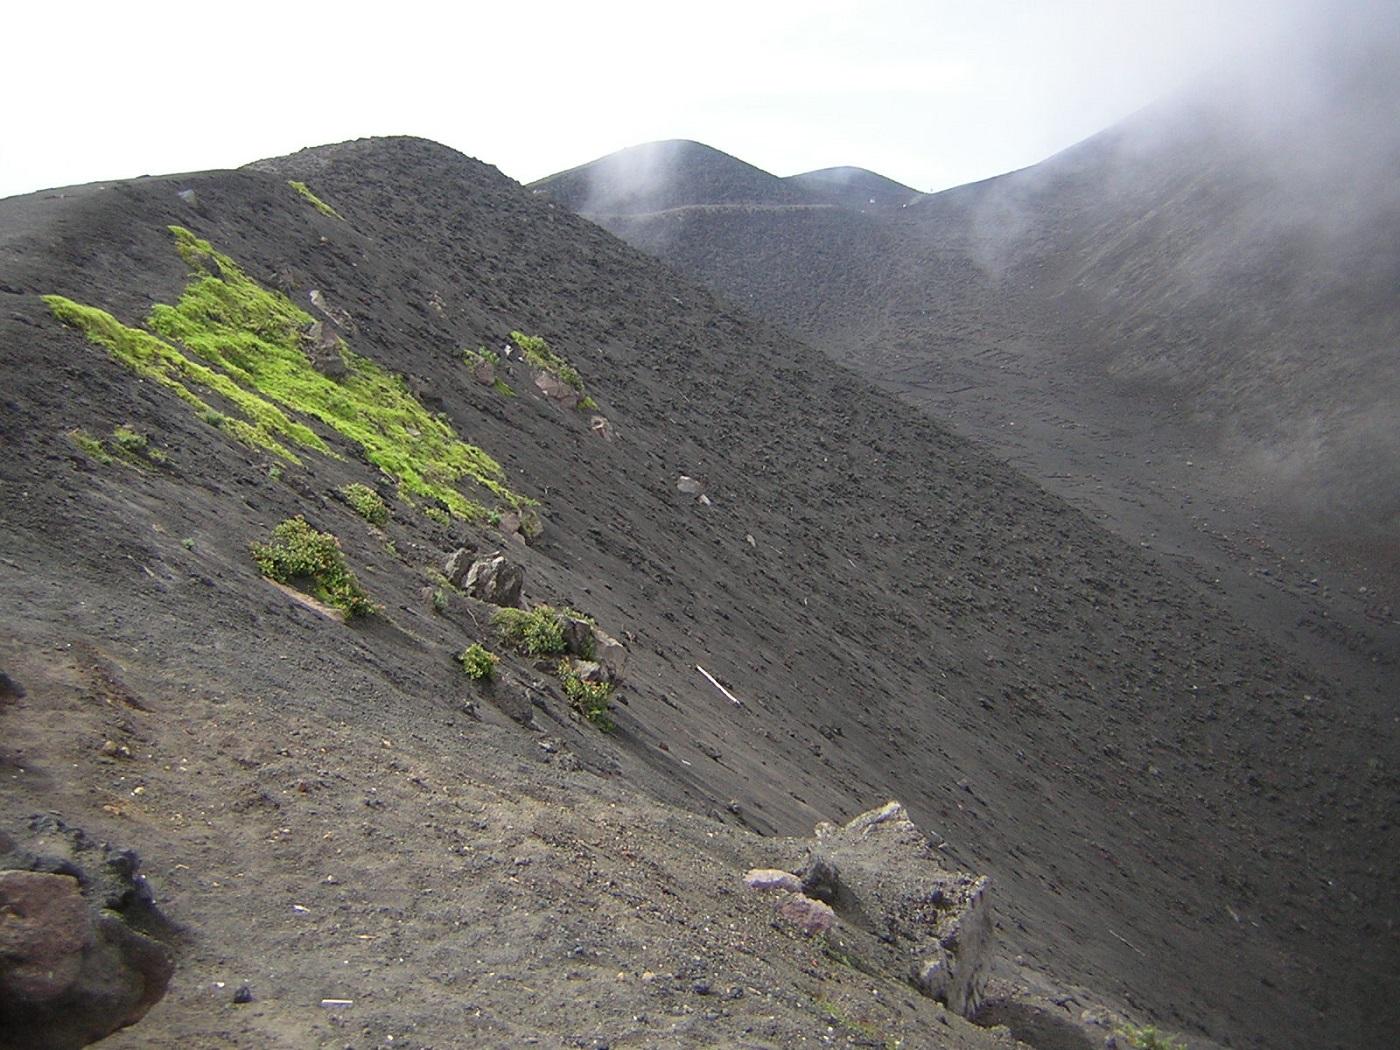 Volcán Pacaya Guatemala (c) Anja Knorr